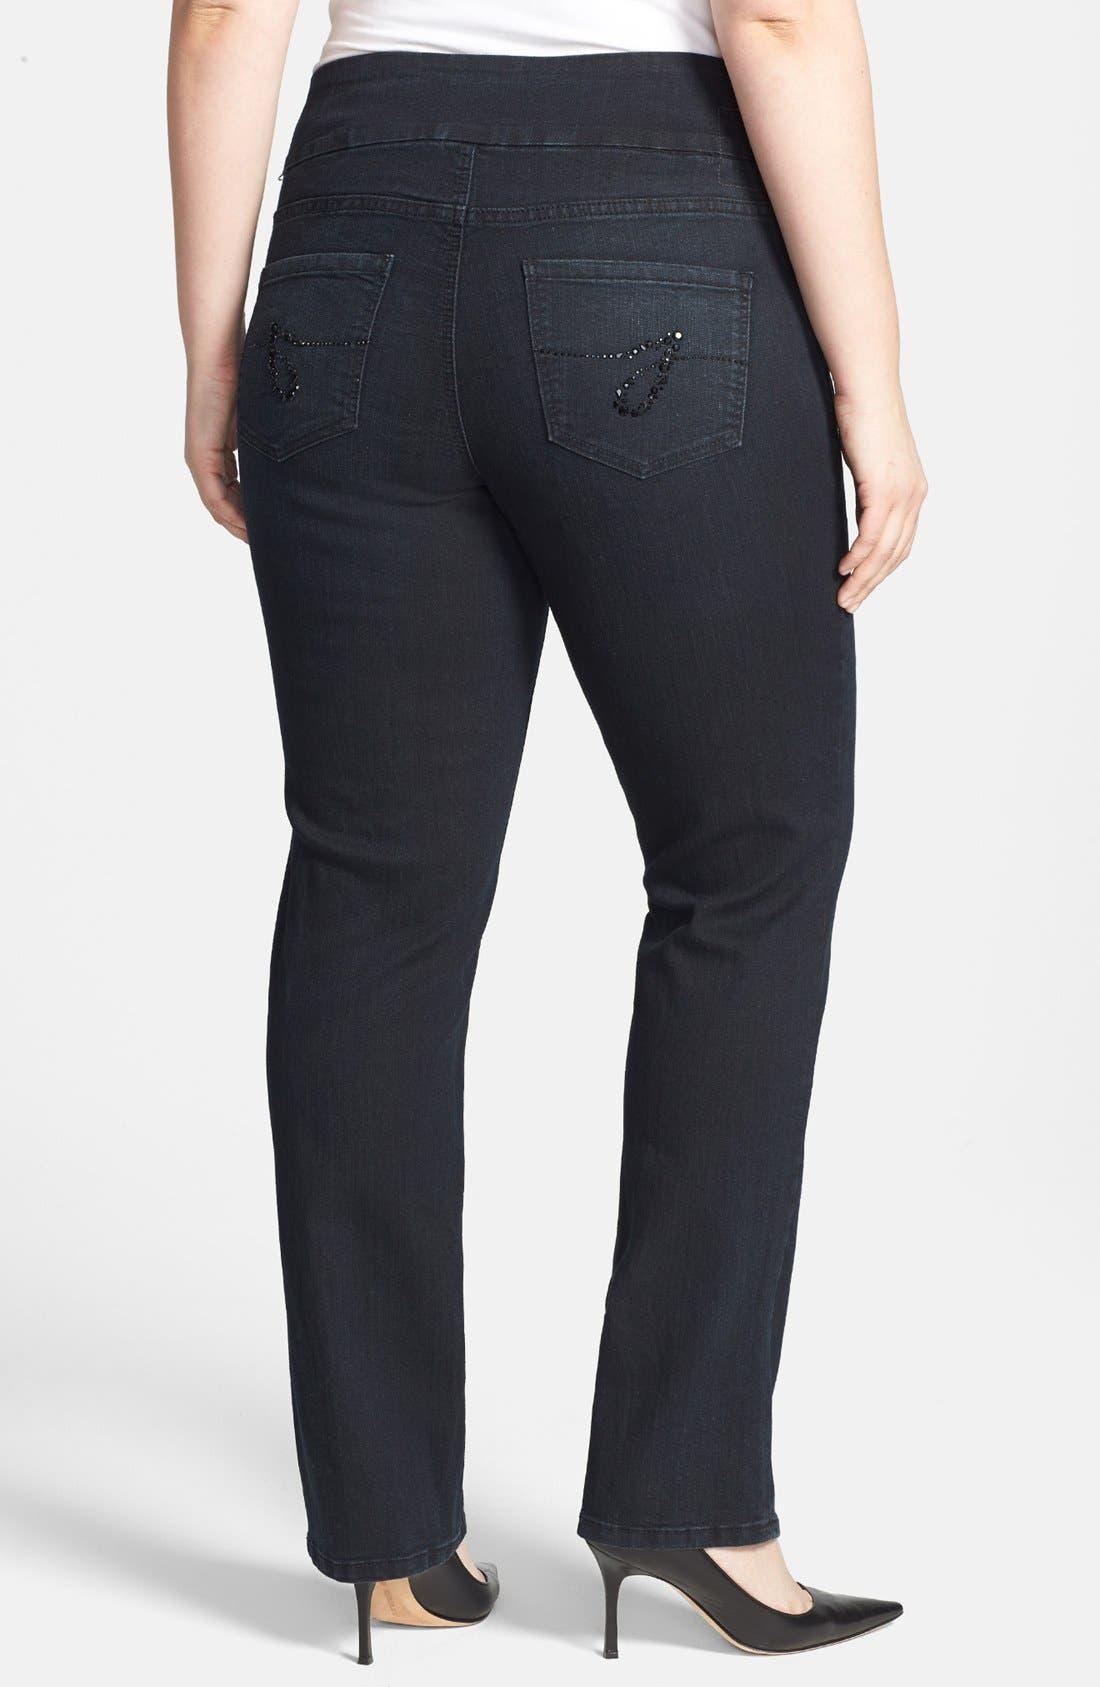 Alternate Image 2  - Jag Jeans 'Mila' Embellished Back Pocket Pull-On Straight Leg Jeans (Plus Size)